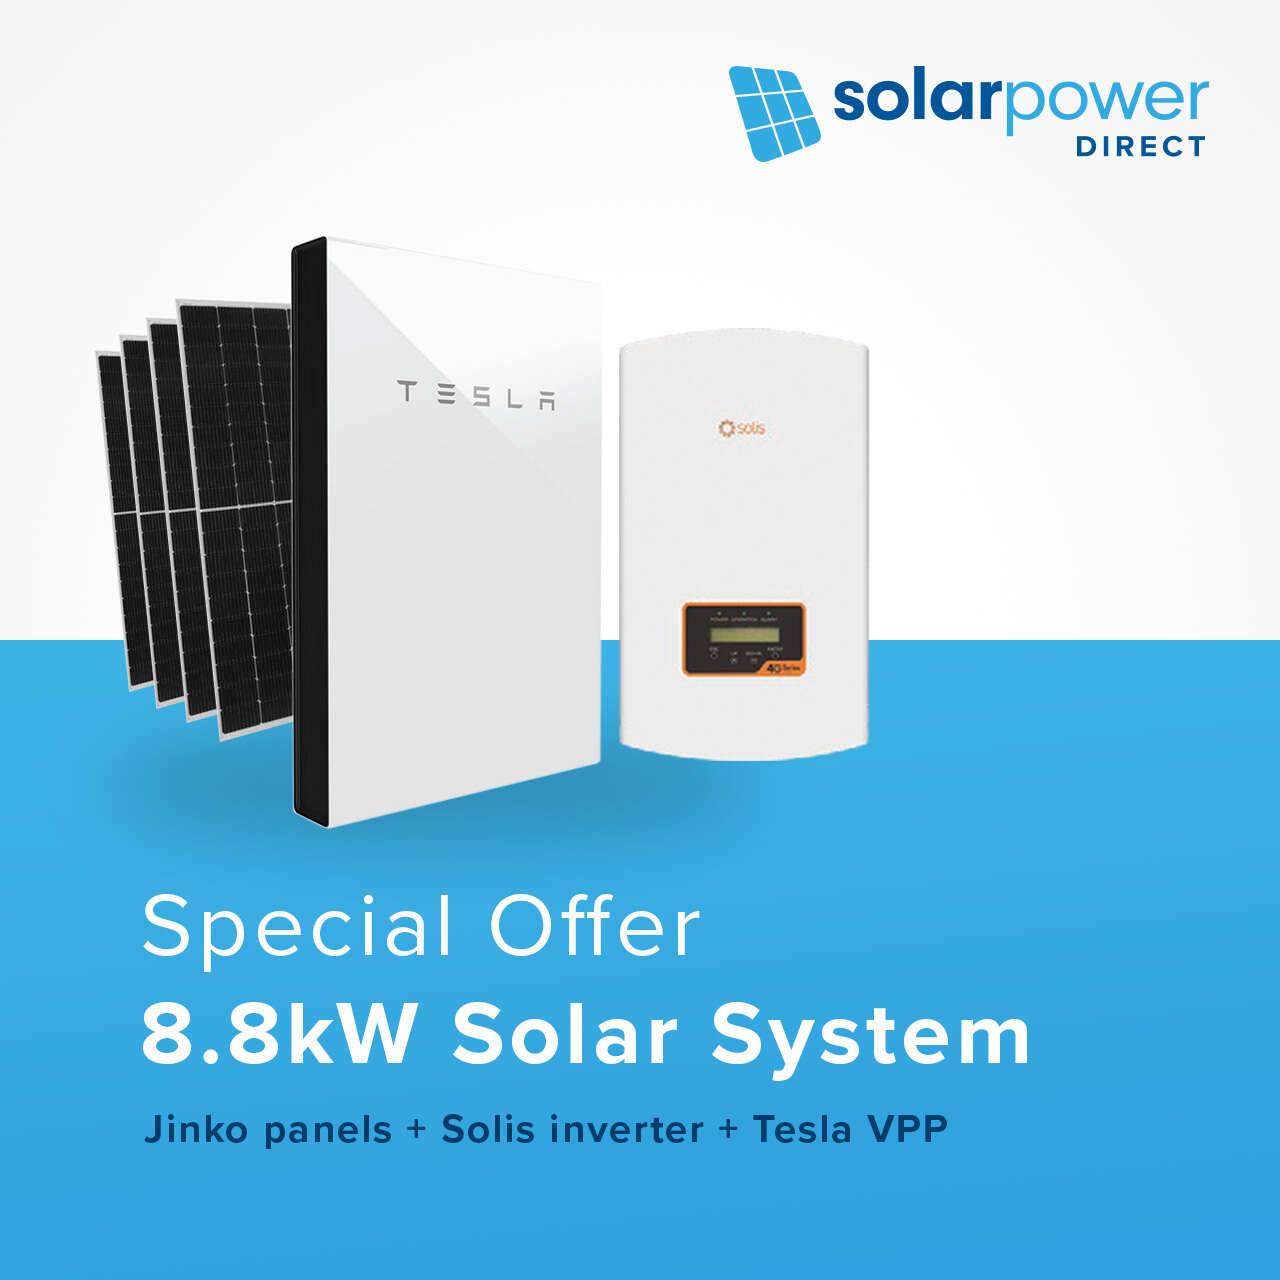 8.8kW Solar System + Tesla VPP for $58 per week